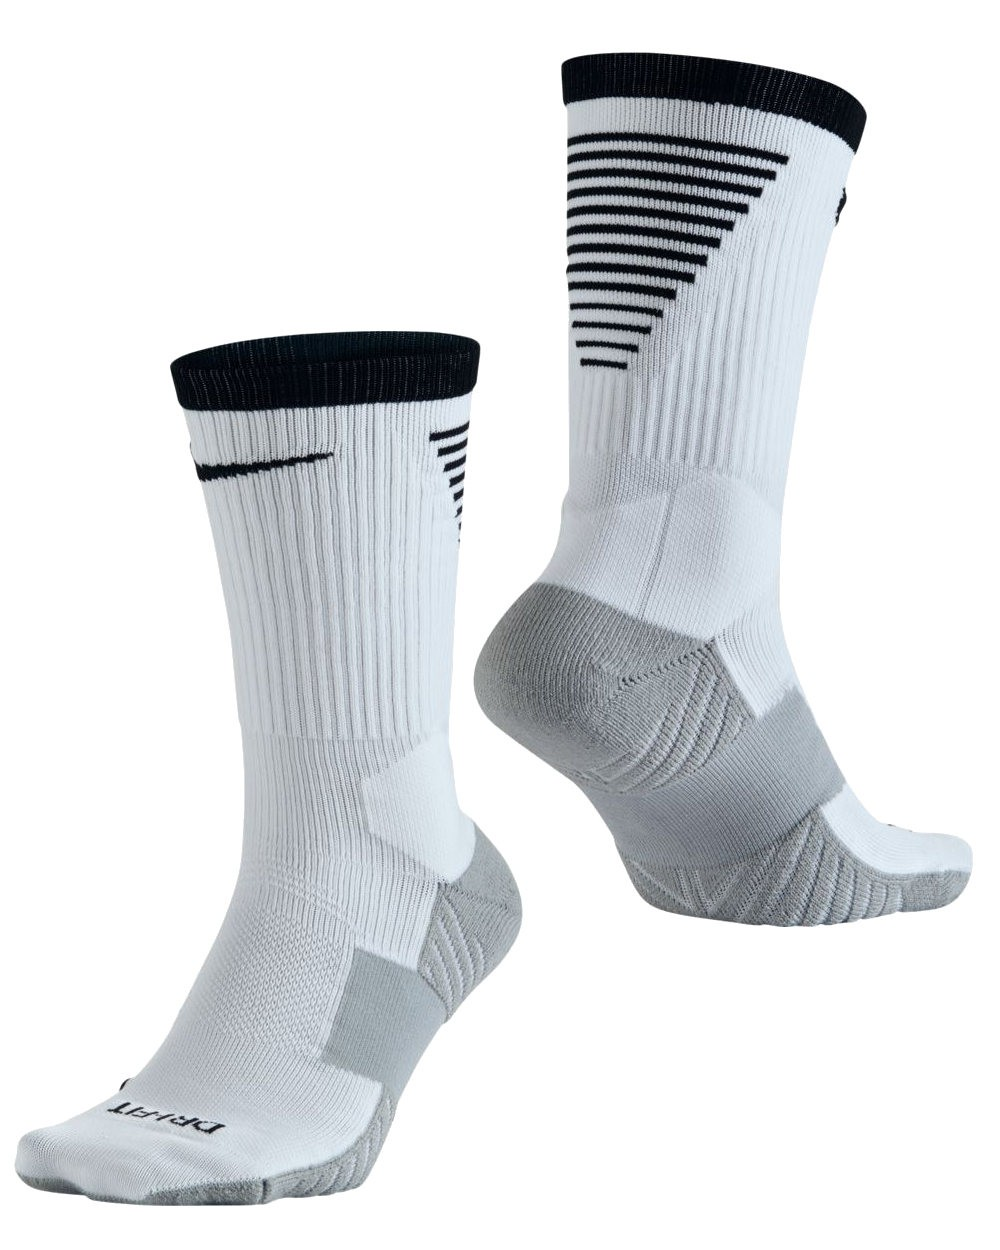 Squad Crew Football Nike Calzettoni Calzini Calze Socks Uomo Bianco 0